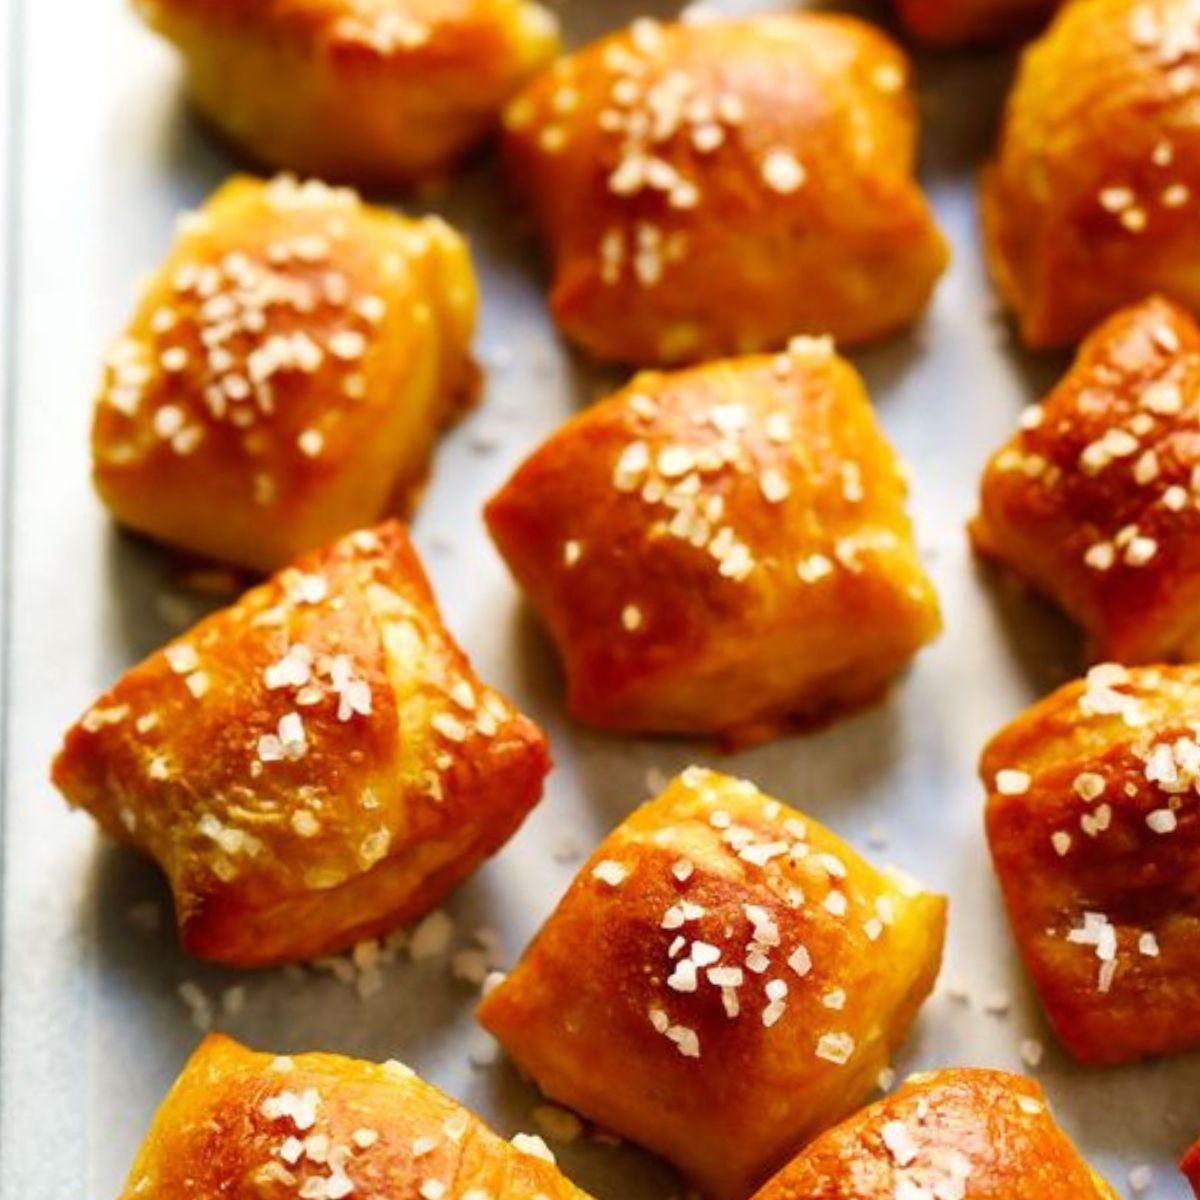 6. Buttery soft pretzel bites